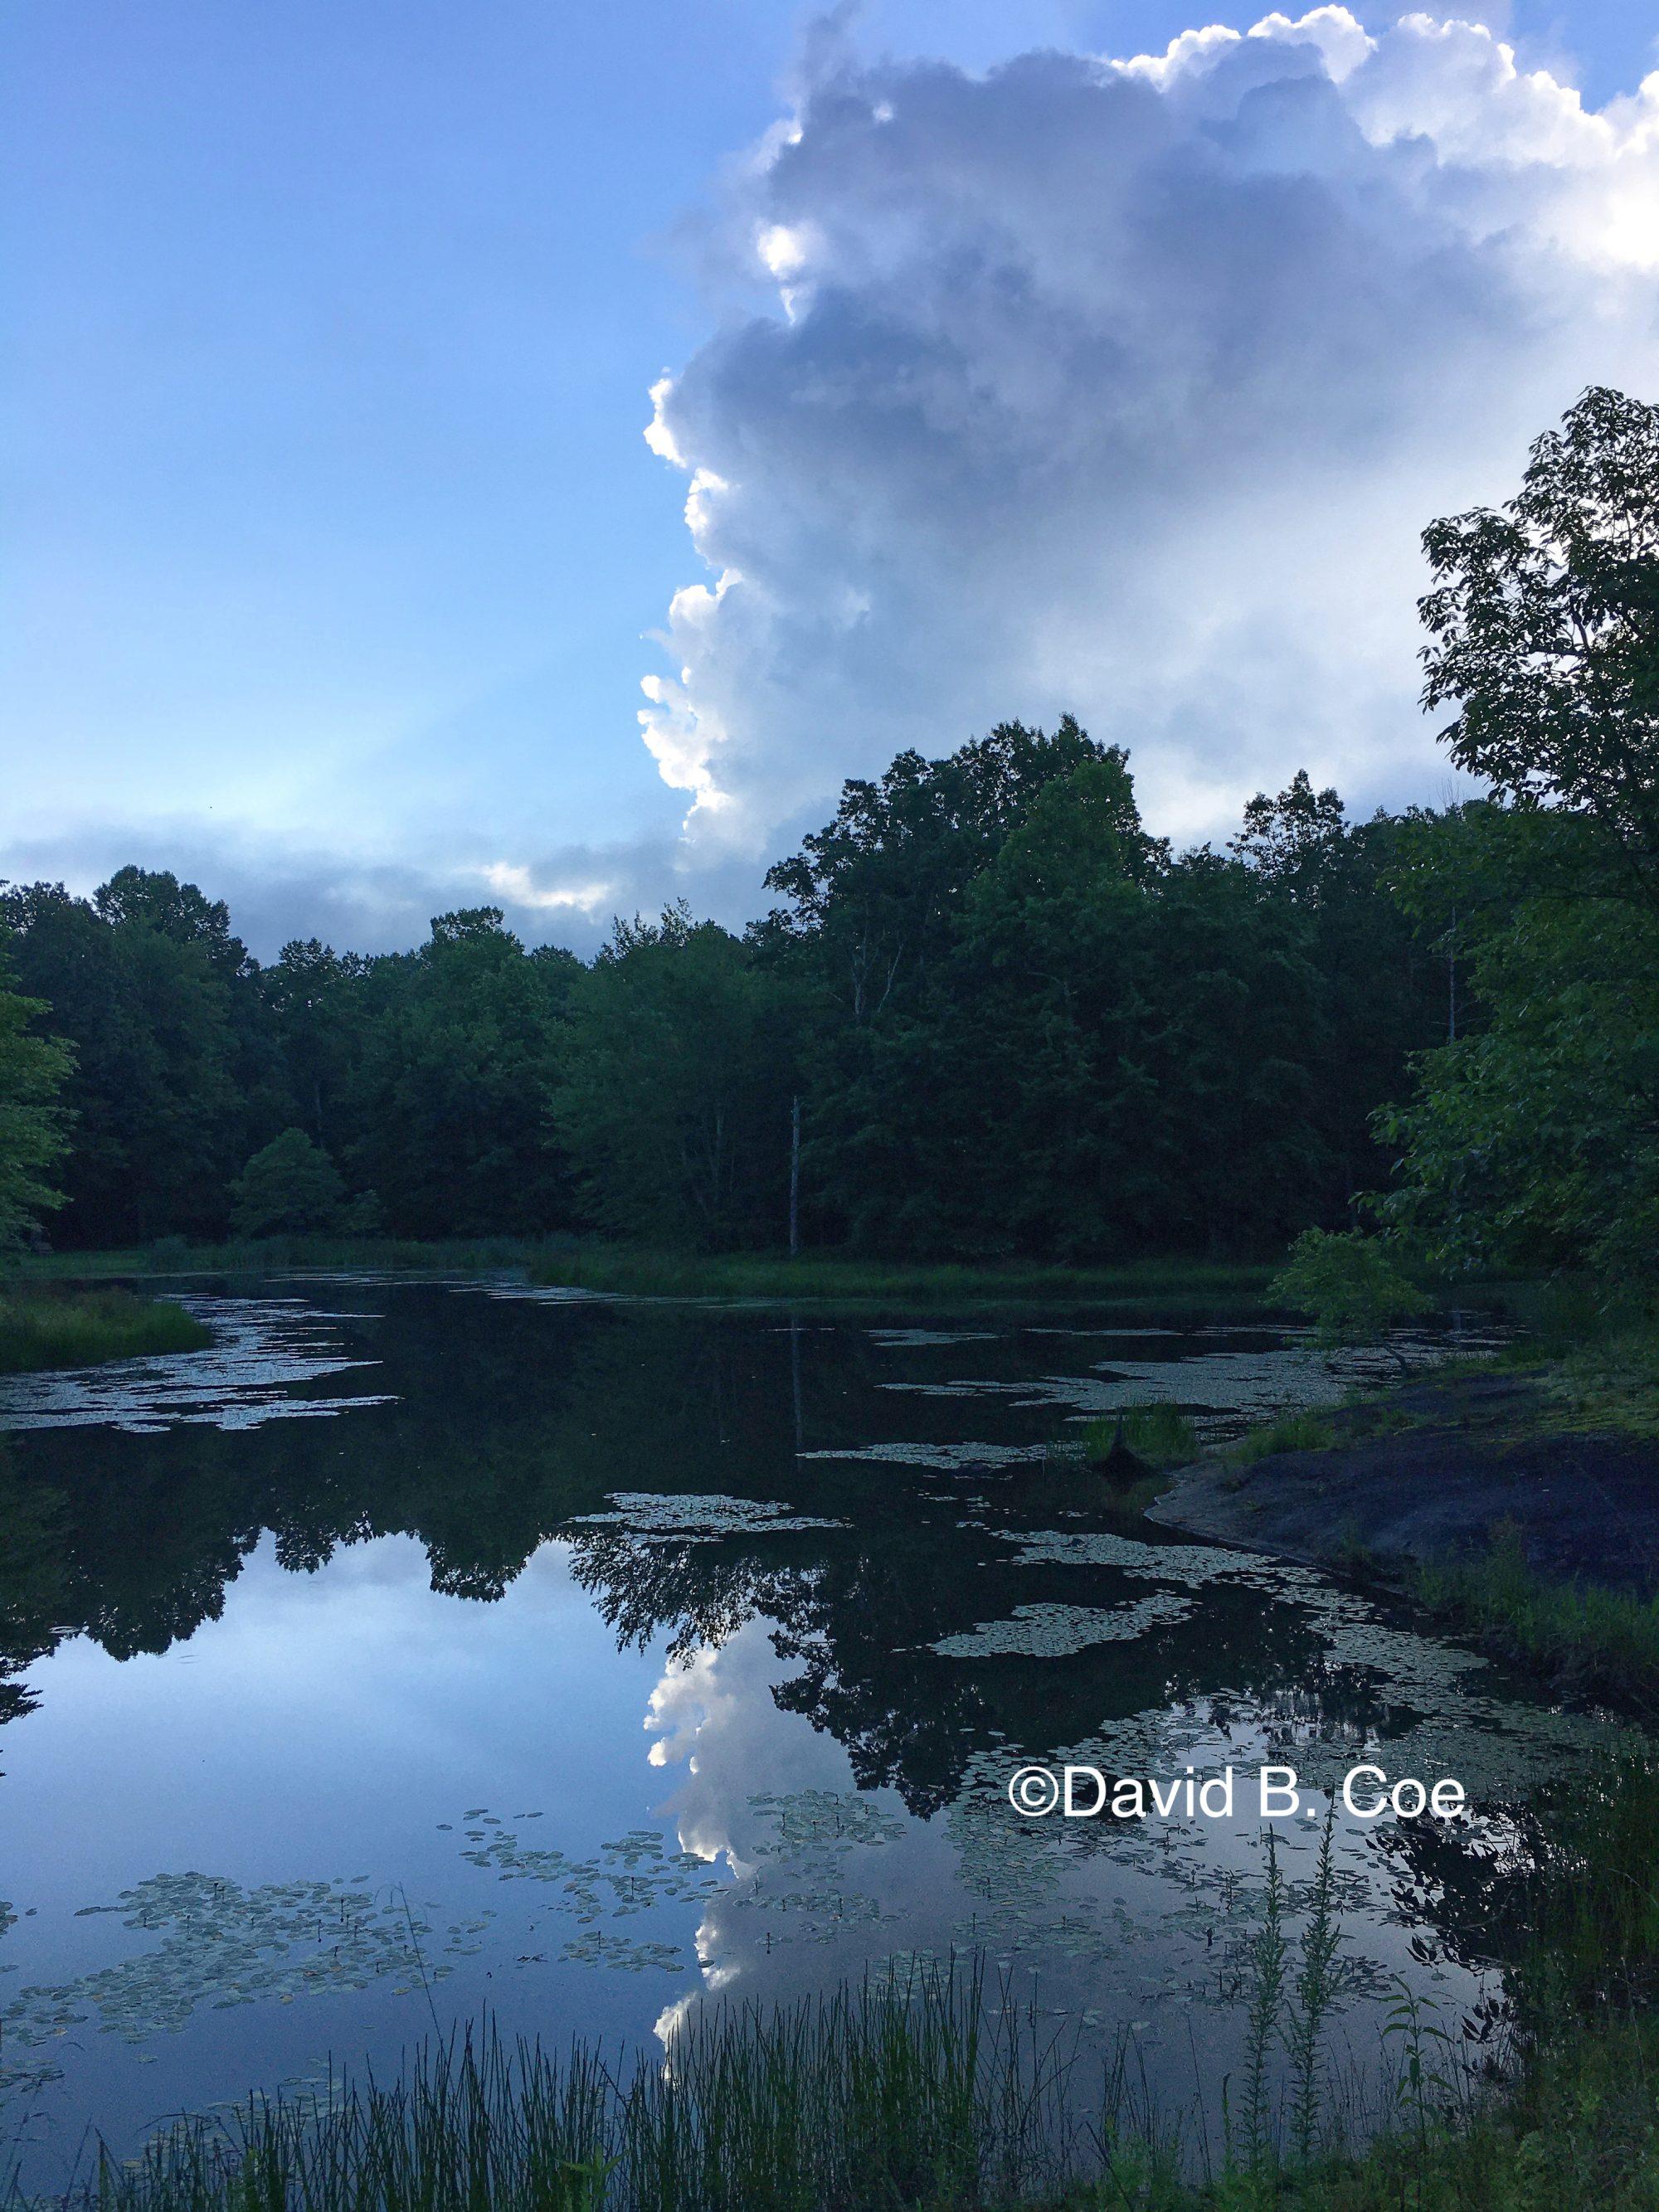 Morning Cloud Reflection, by David B. Coe